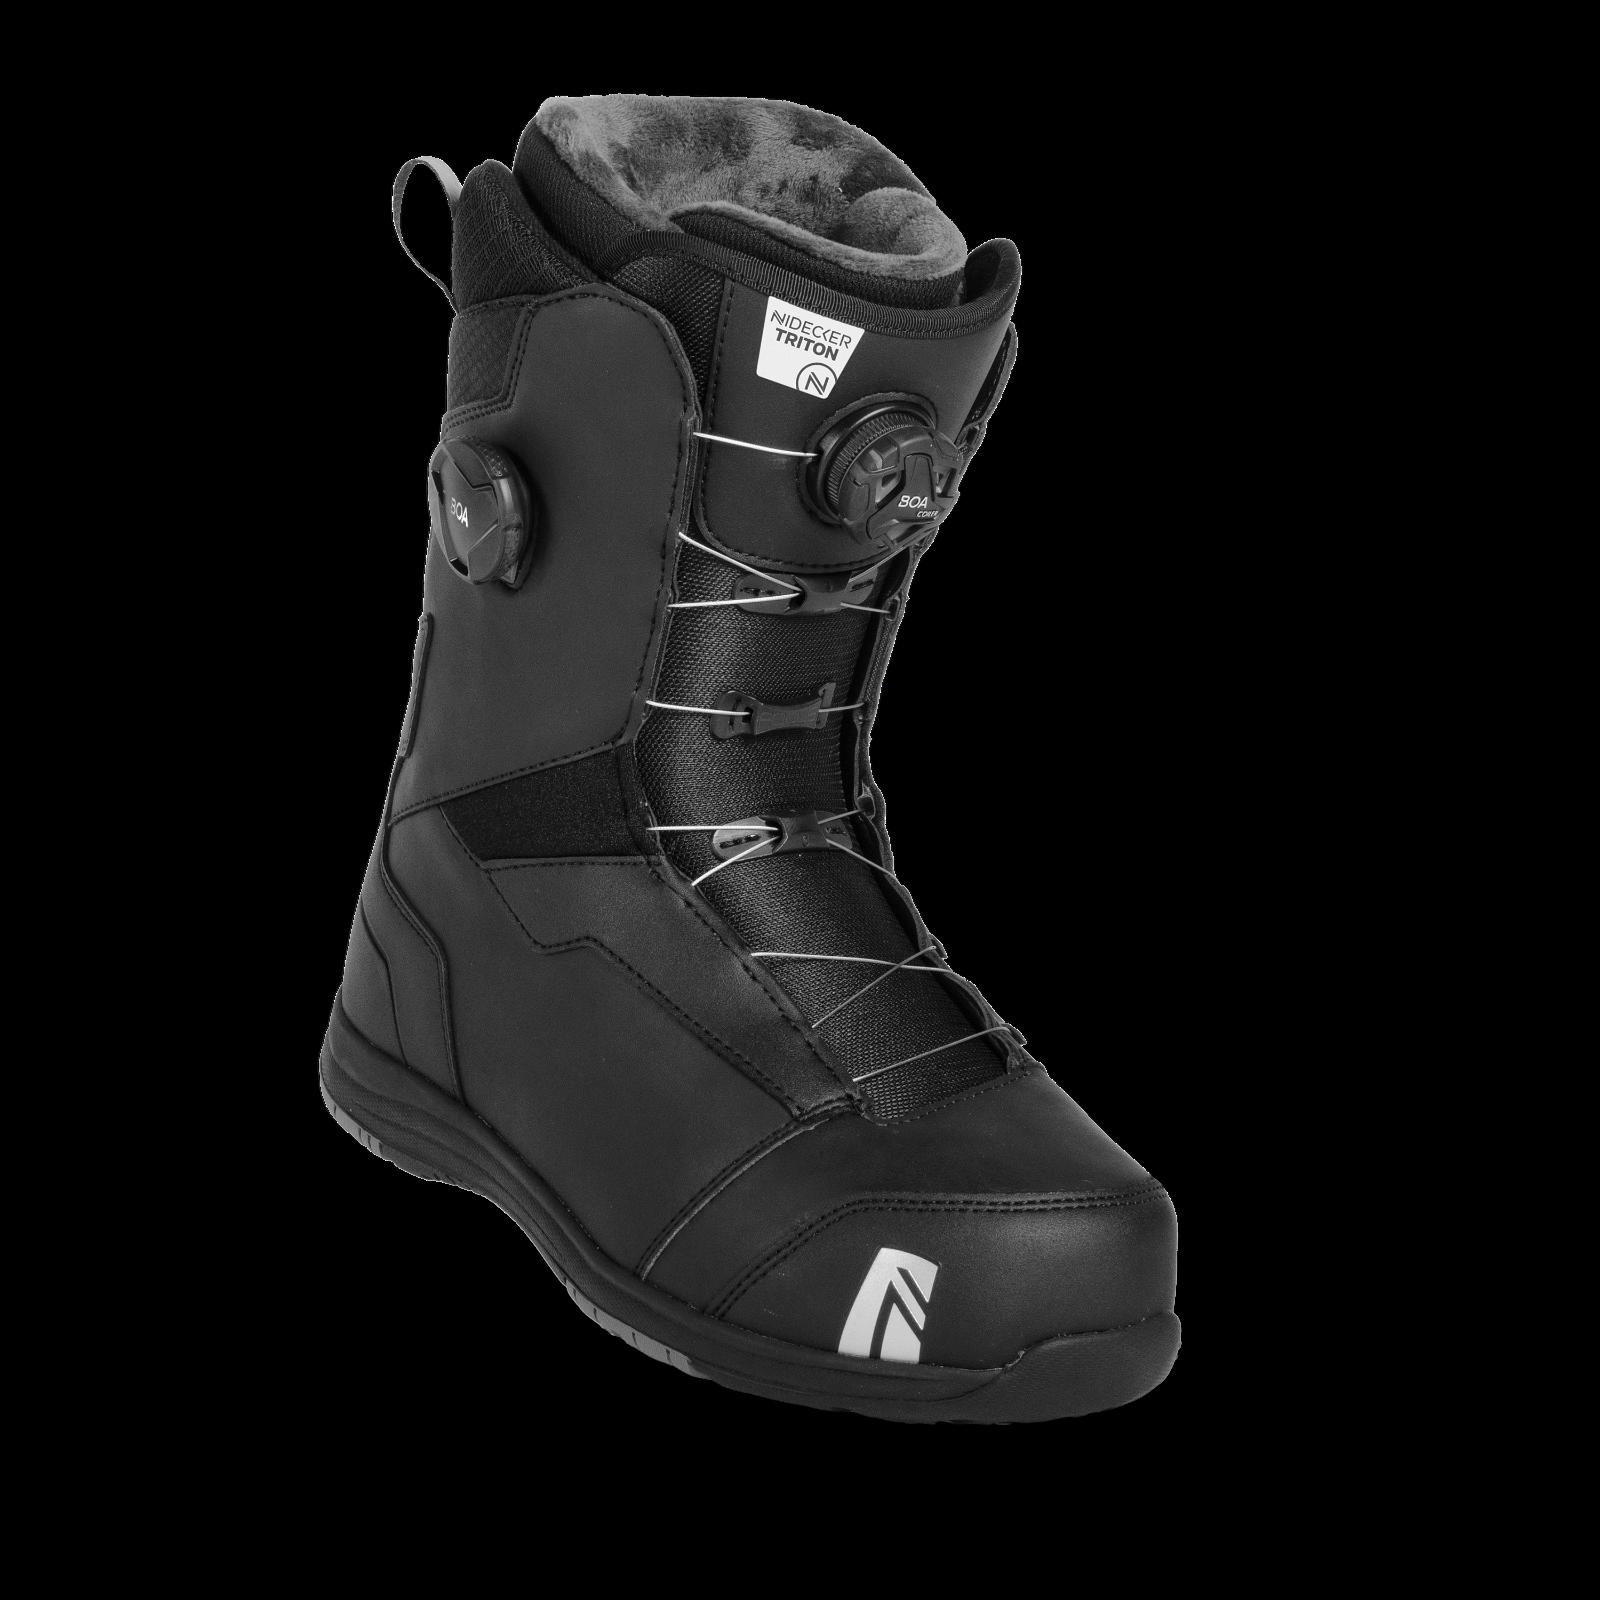 Stiefel Snowboard Stiefel Nidecker Triton Boa Focus 2019